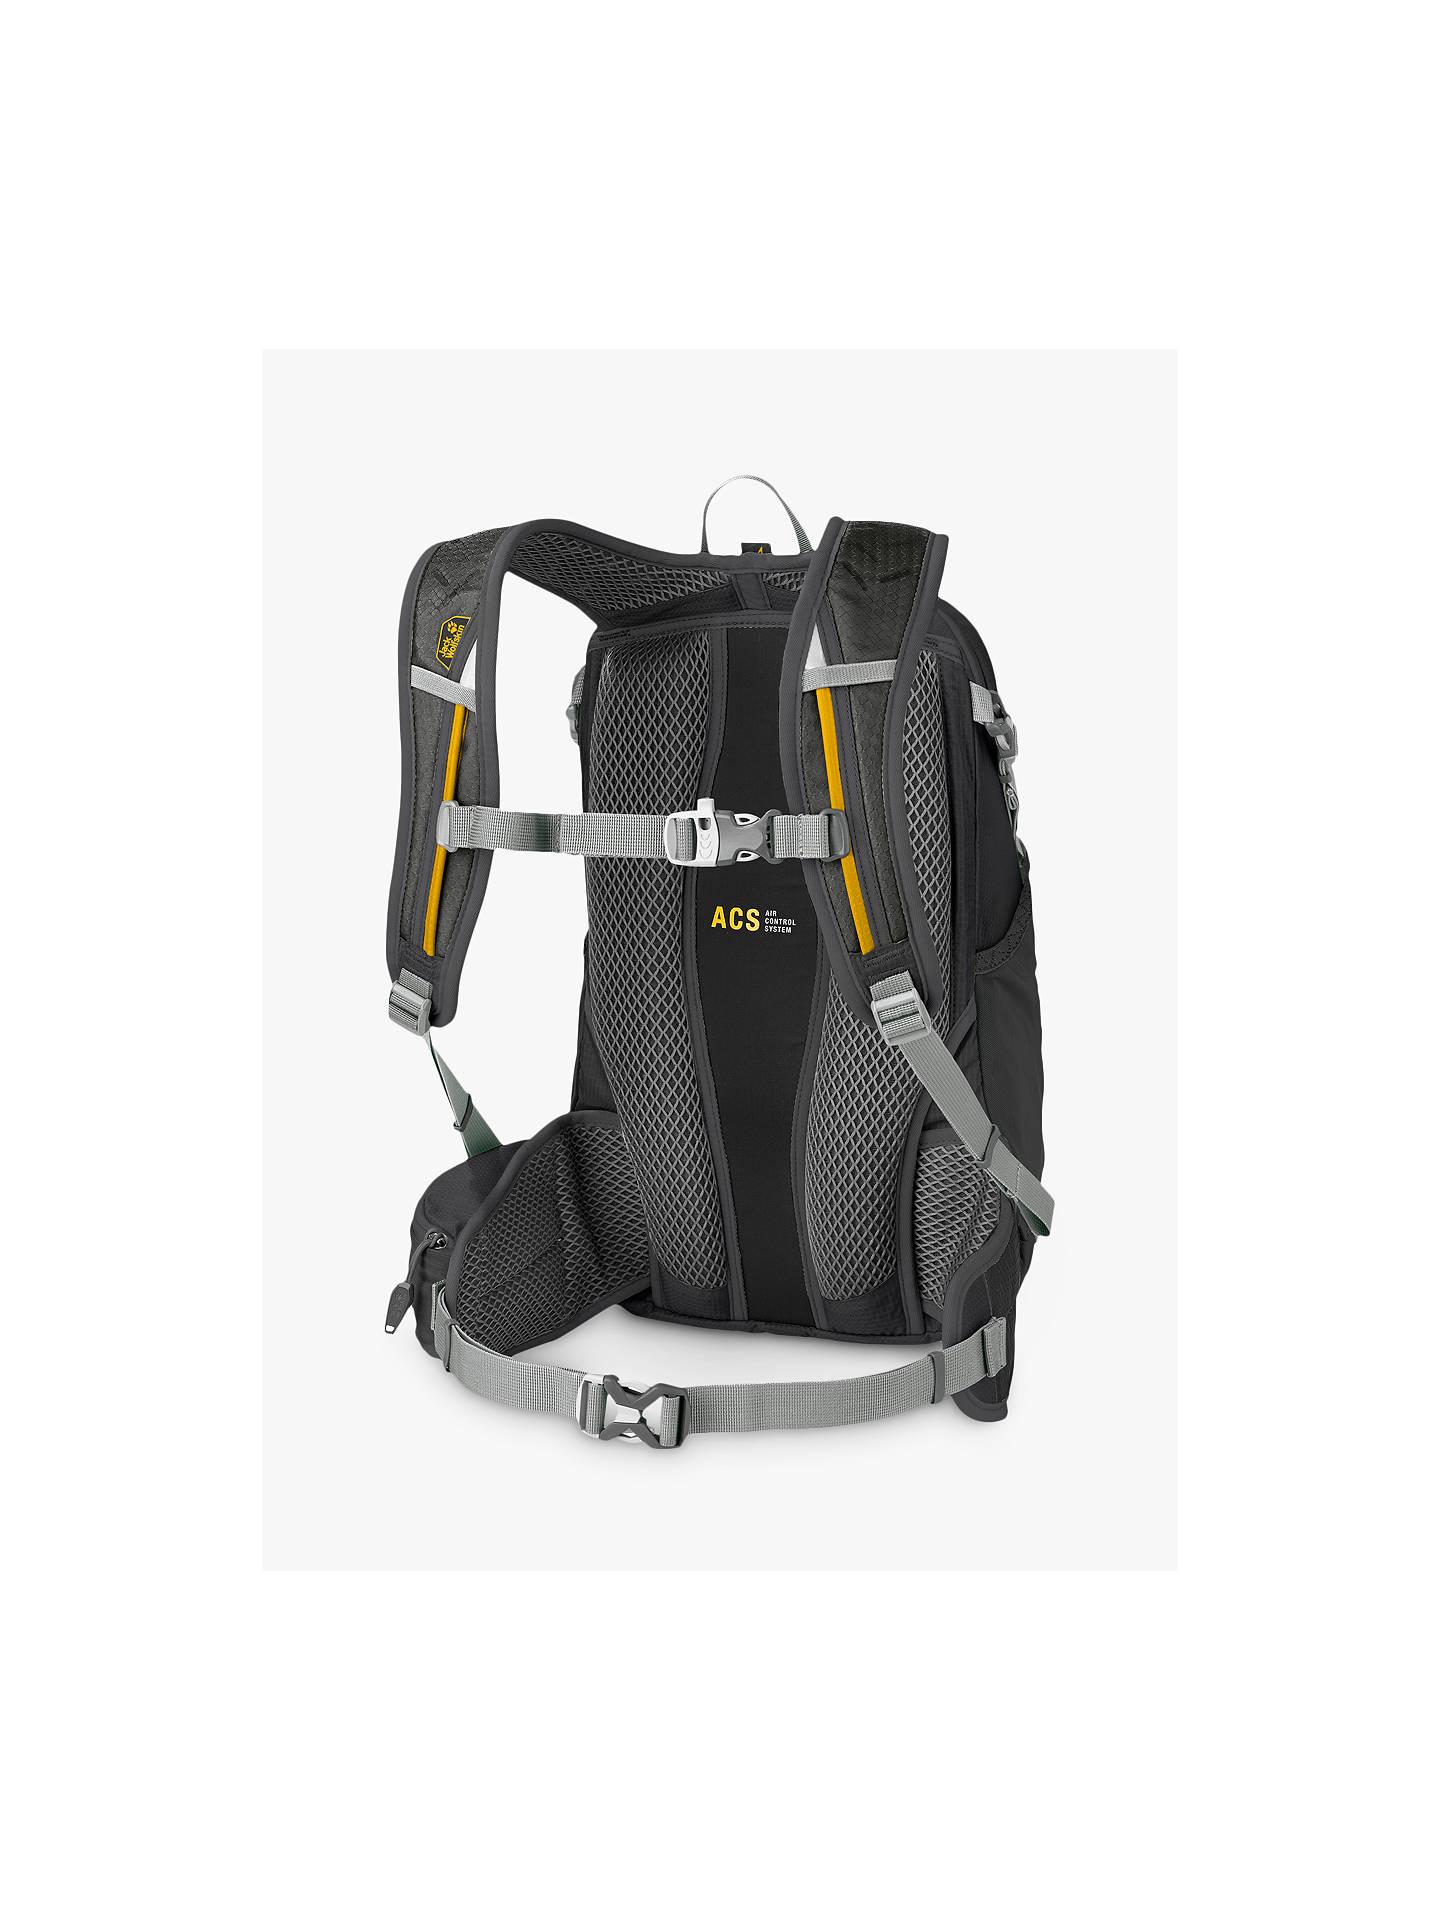 Jack Wolfskin MOAB Jam 18 Backpack, Black